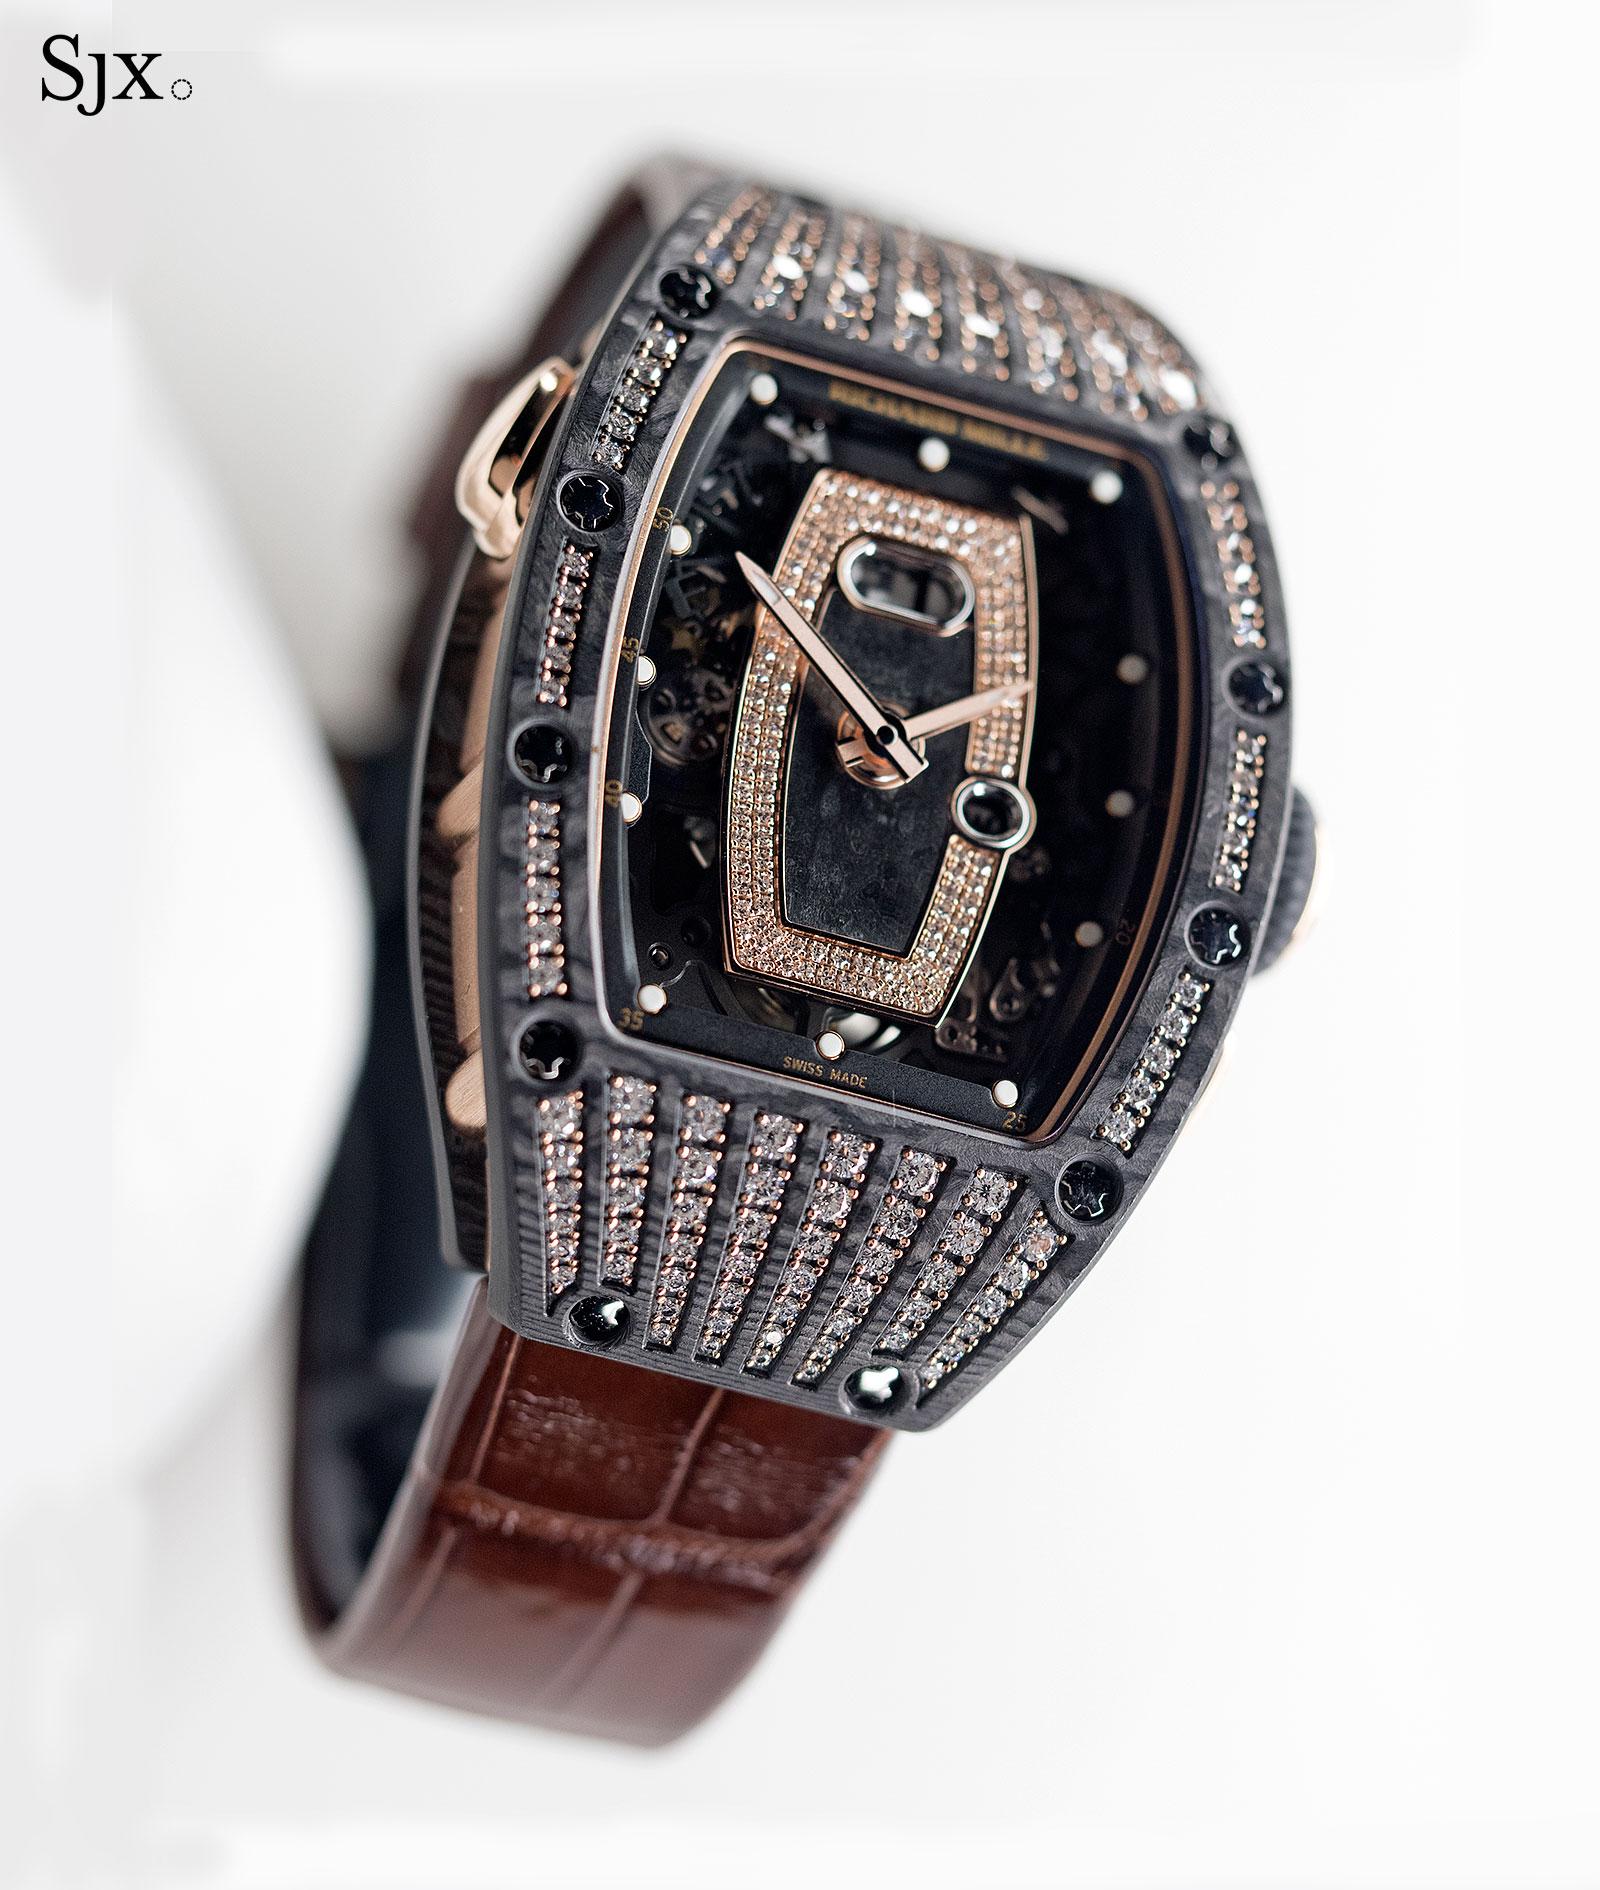 Richard Mille RM037 NTPT gem-set